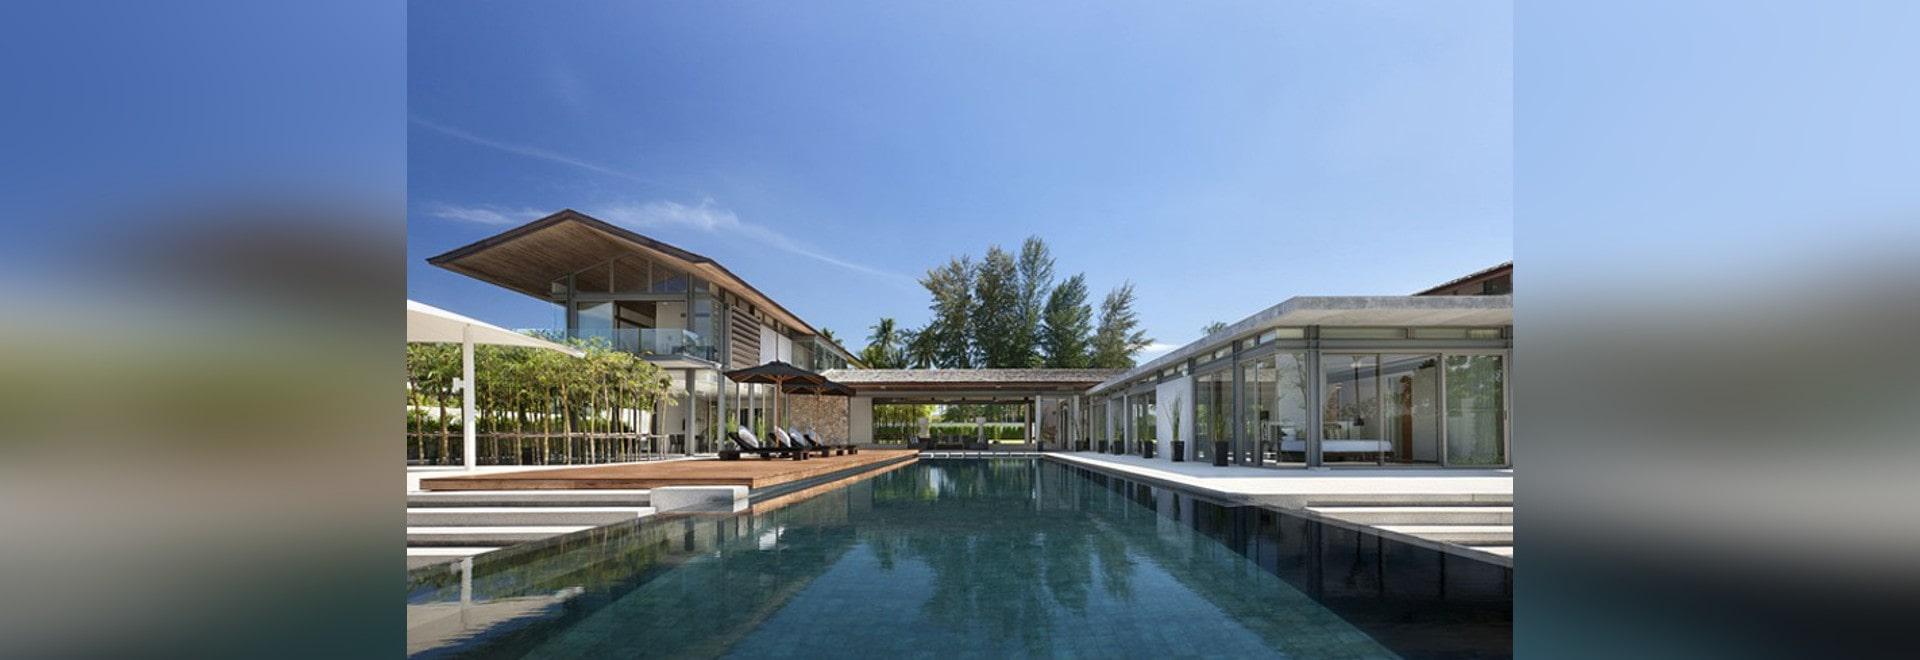 original vision constructs sava sai around a 25 meter pool